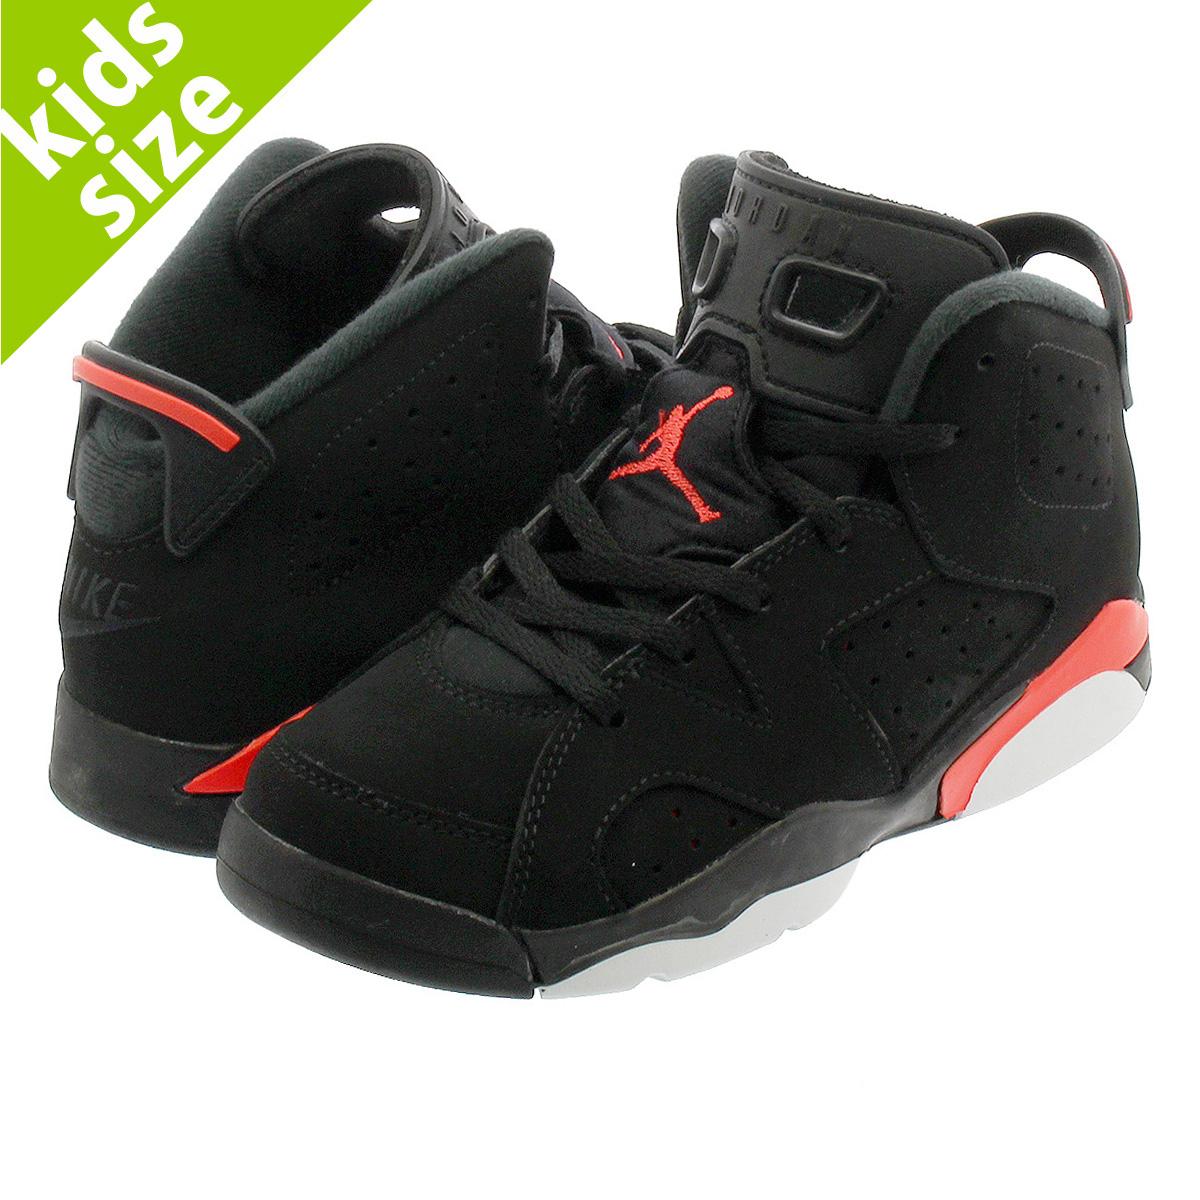 efcd1865e11 NIKE AIR JORDAN 6 RETRO BP Nike Air Jordan 6 nostalgic BP BLACK/INFRARED  384,666 ...